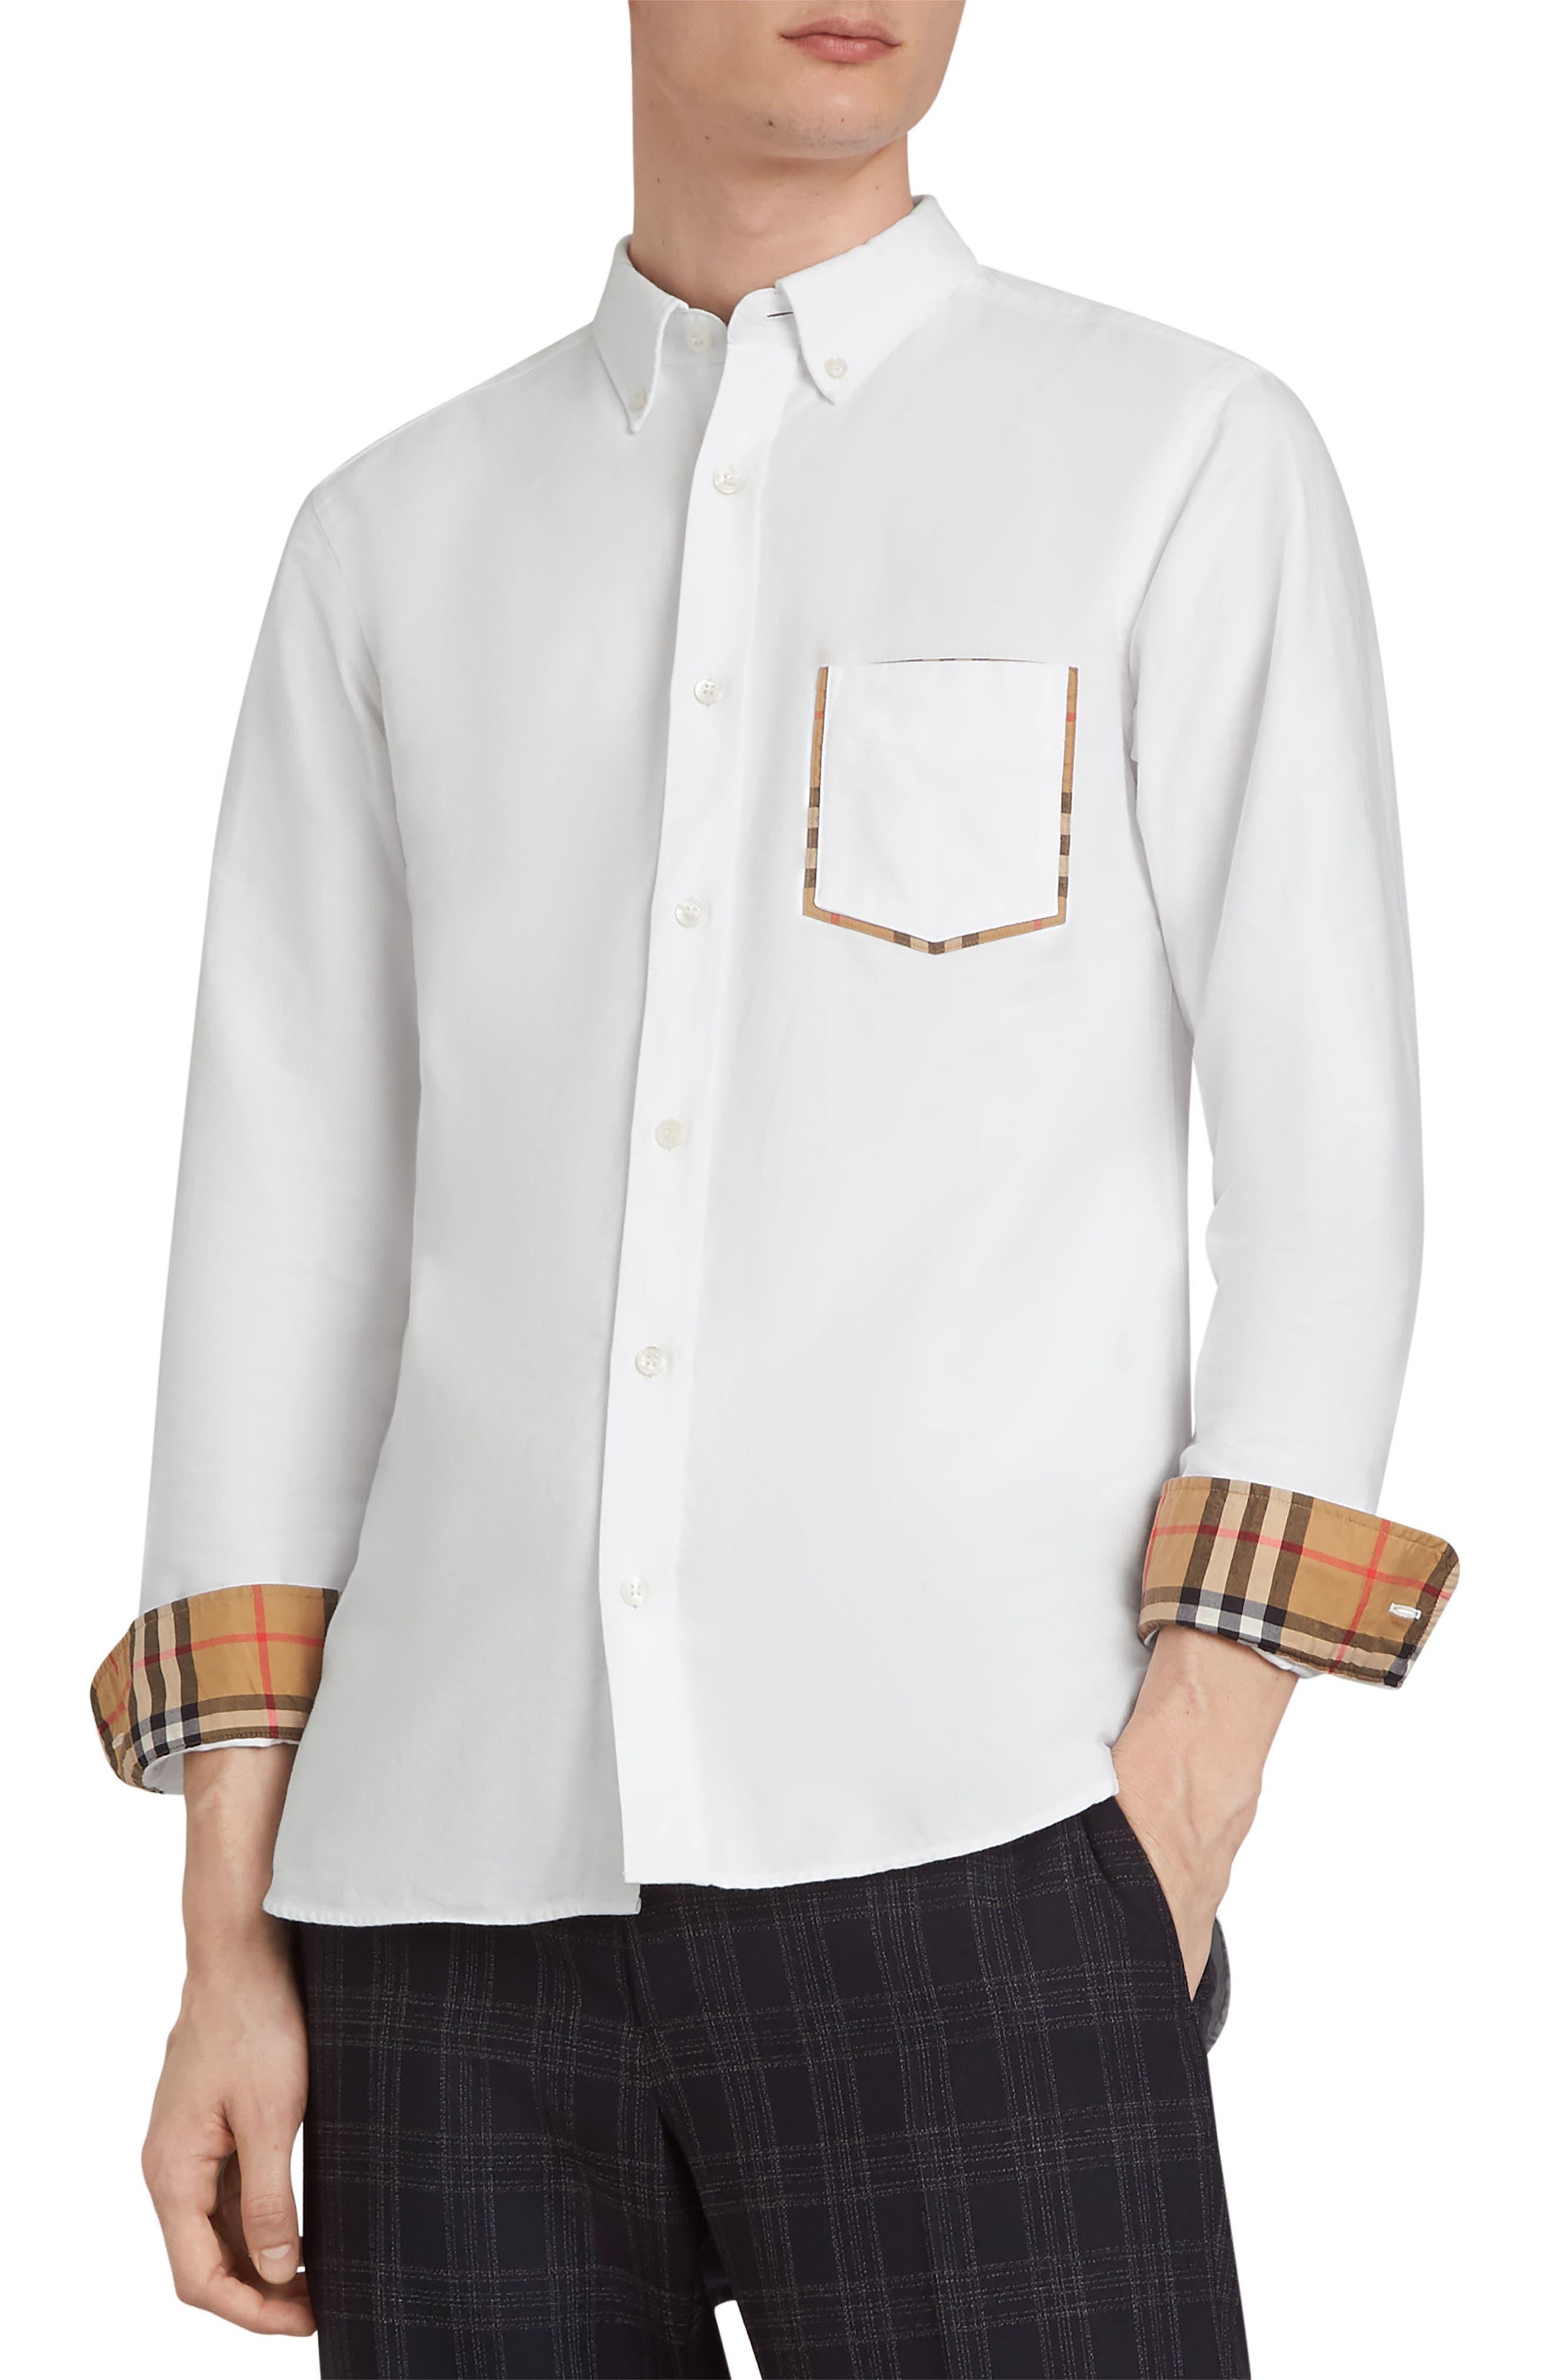 BURBERRY,                             Harry Check Trim Sport Shirt,                             Alternate thumbnail 2, color,                             WHITE